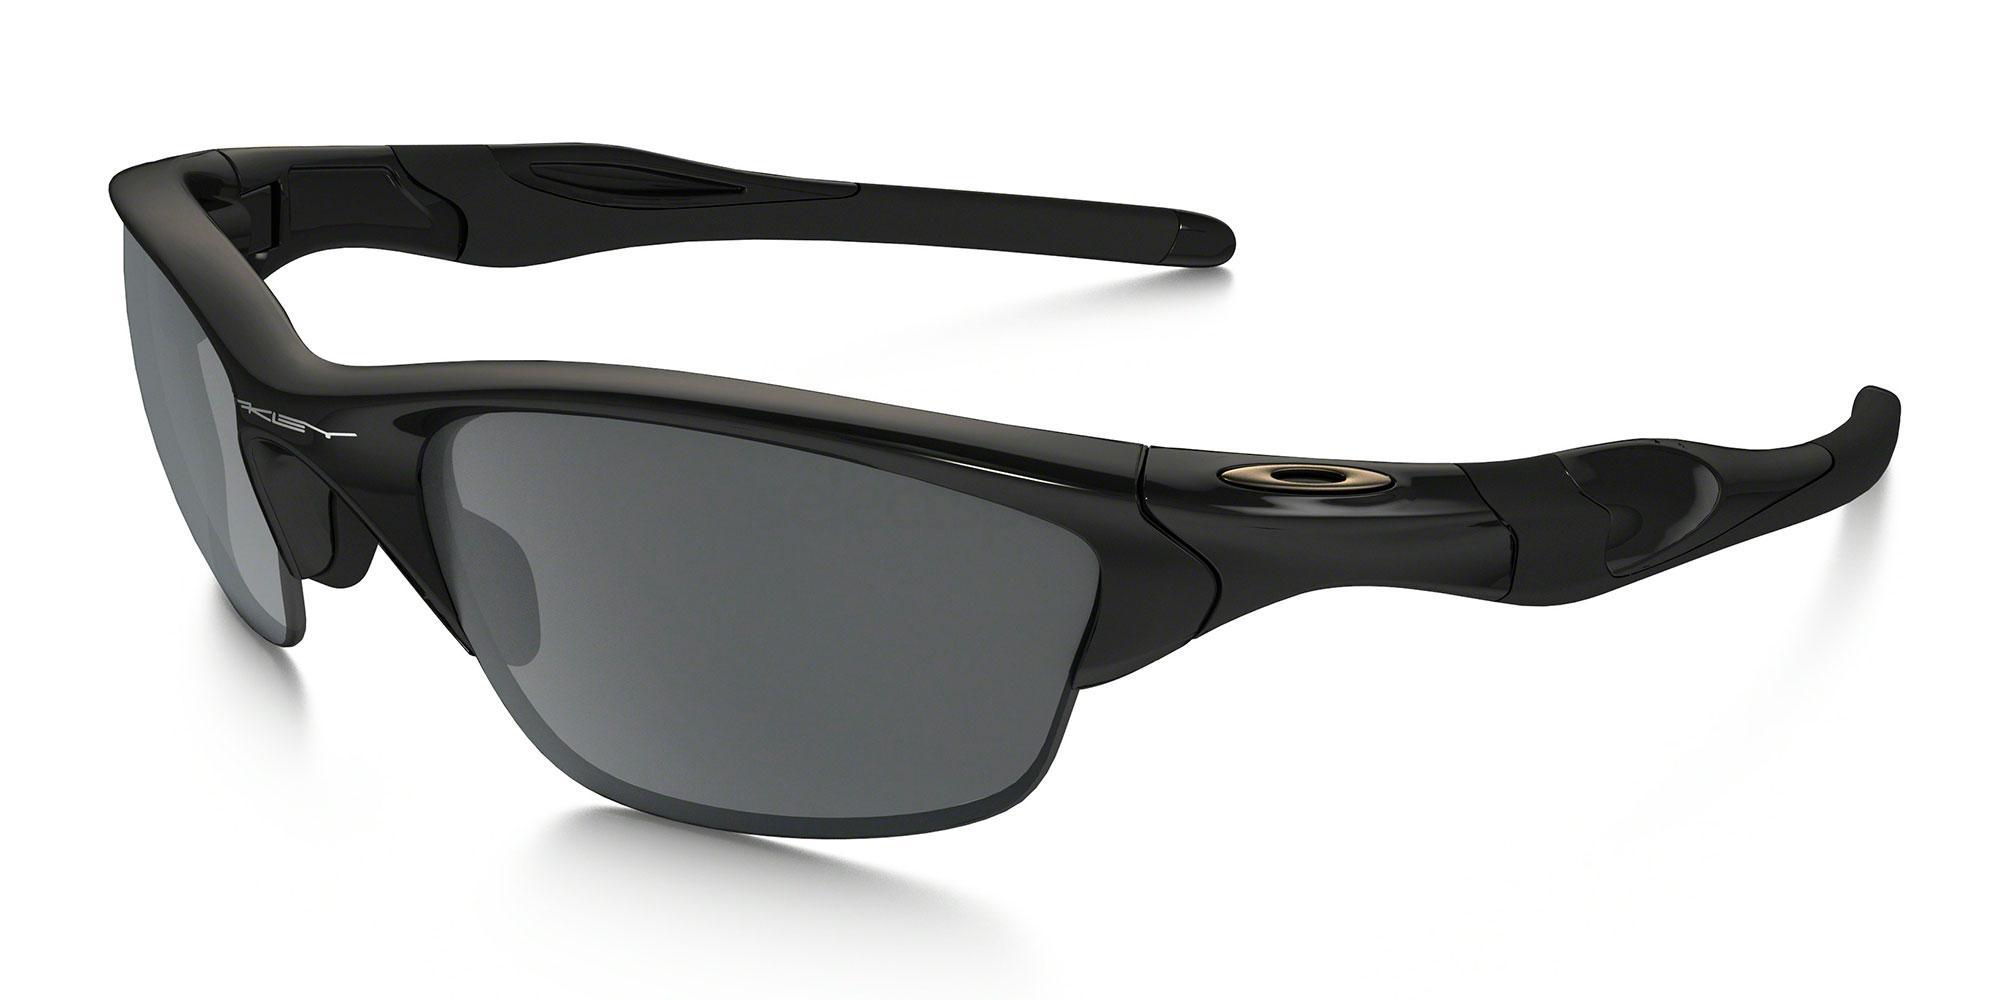 914401 OO9144 HALF JACKET 2.0 (Standard) Sunglasses, Oakley